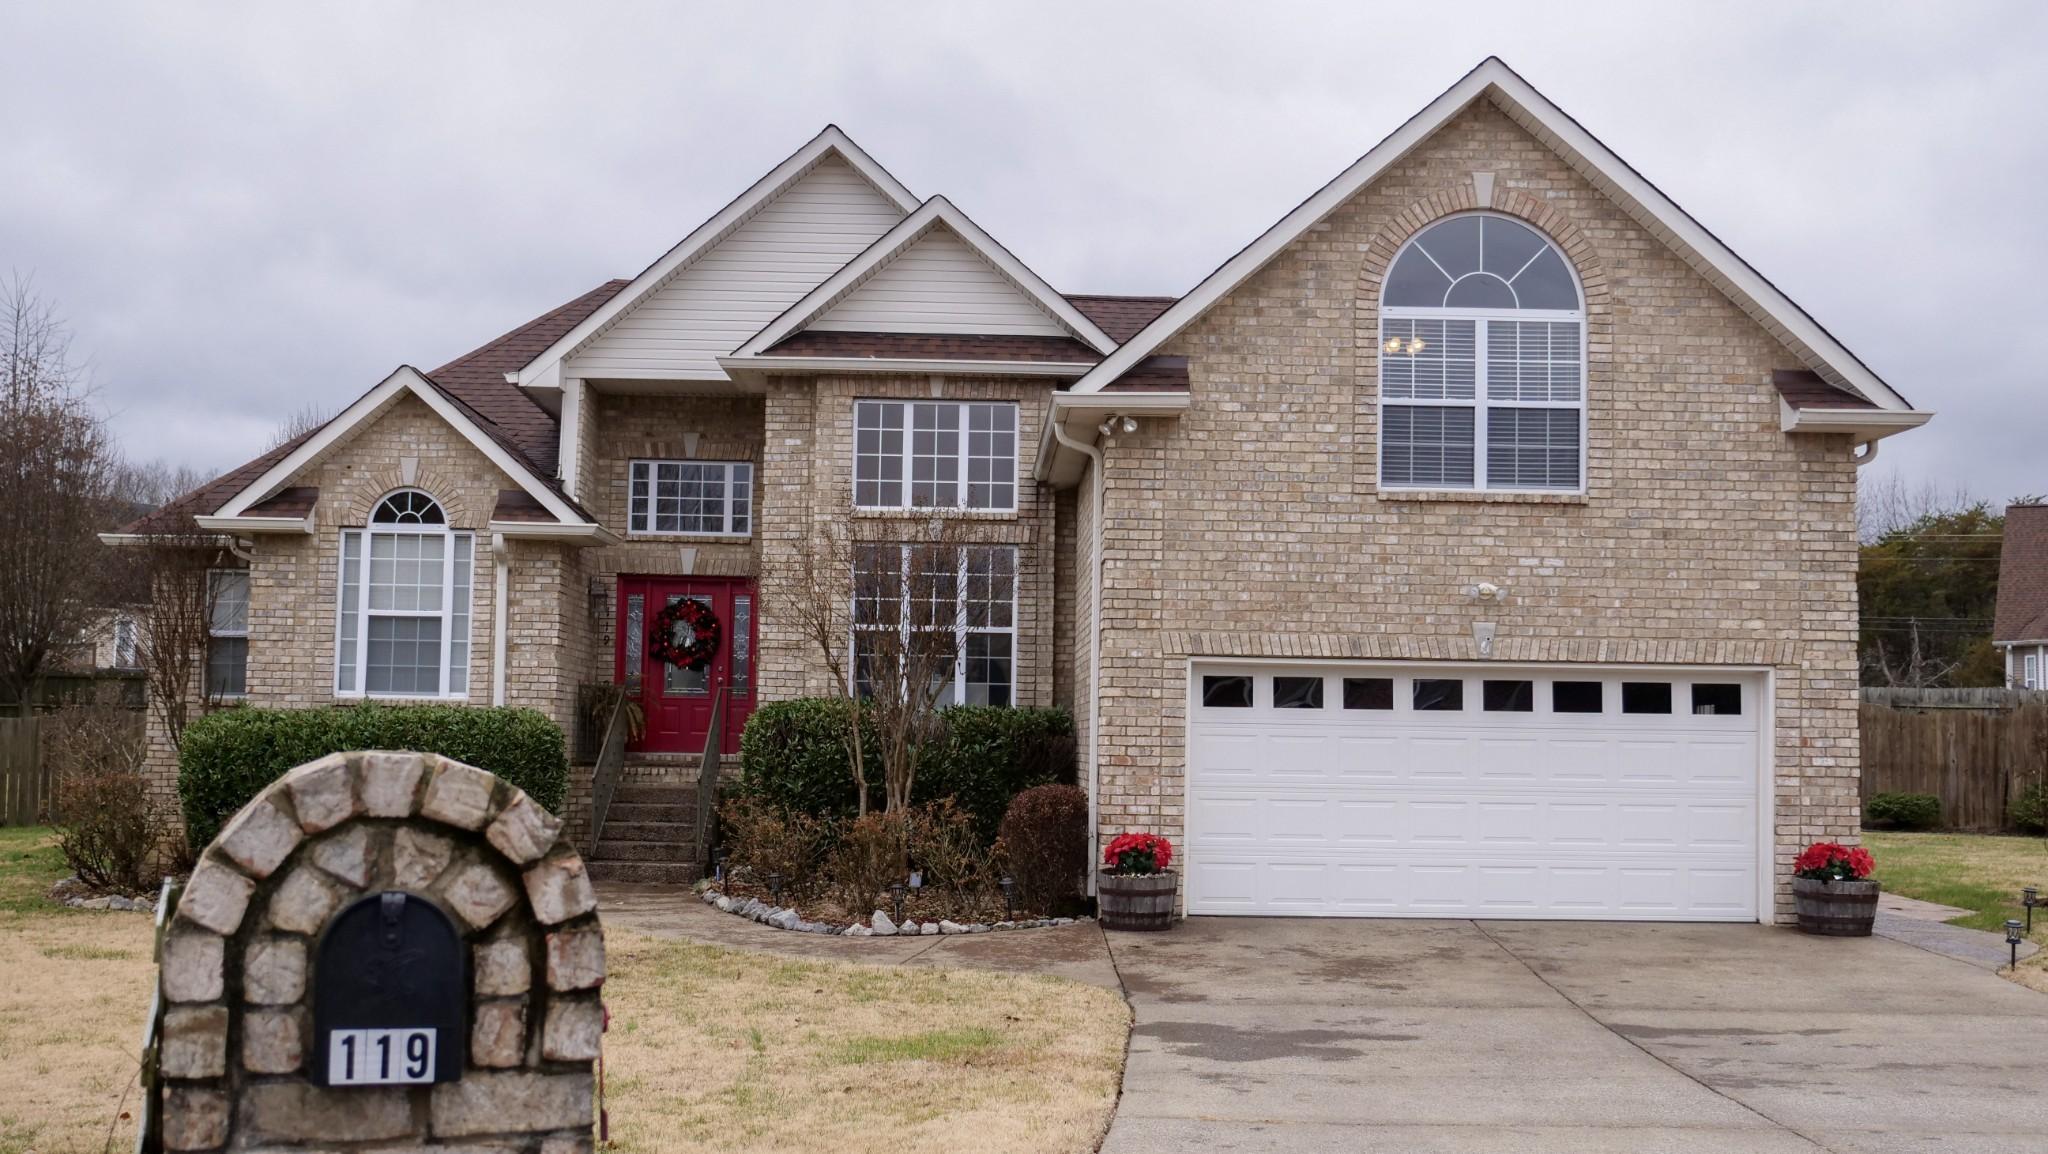 119 Danbury Ct, White House, TN 37188 - White House, TN real estate listing